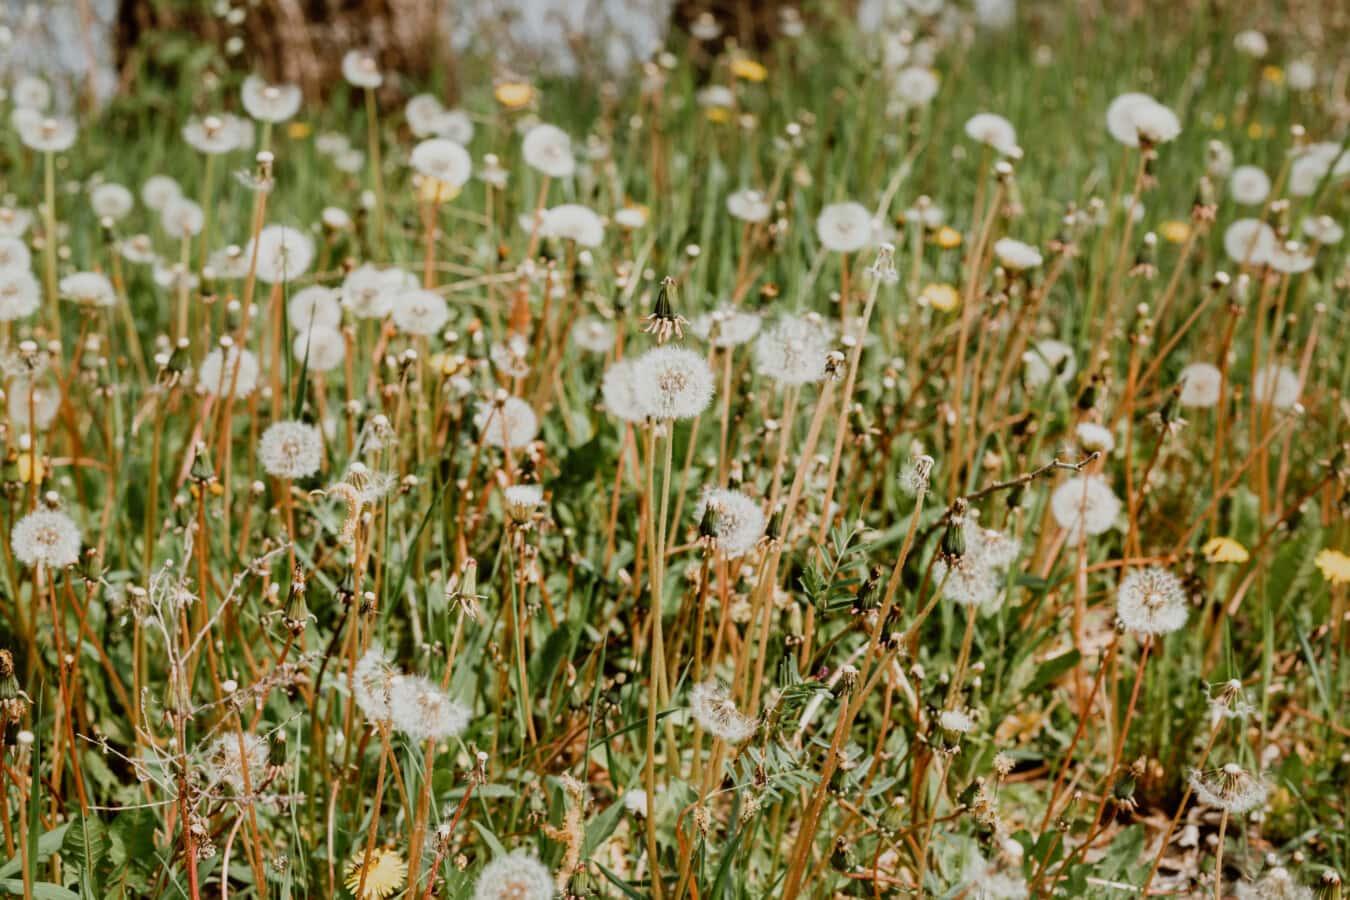 Dandelion, musim panas, berumput, cerah, ramuan, musim panas, tanaman, alam, rumput, bunga